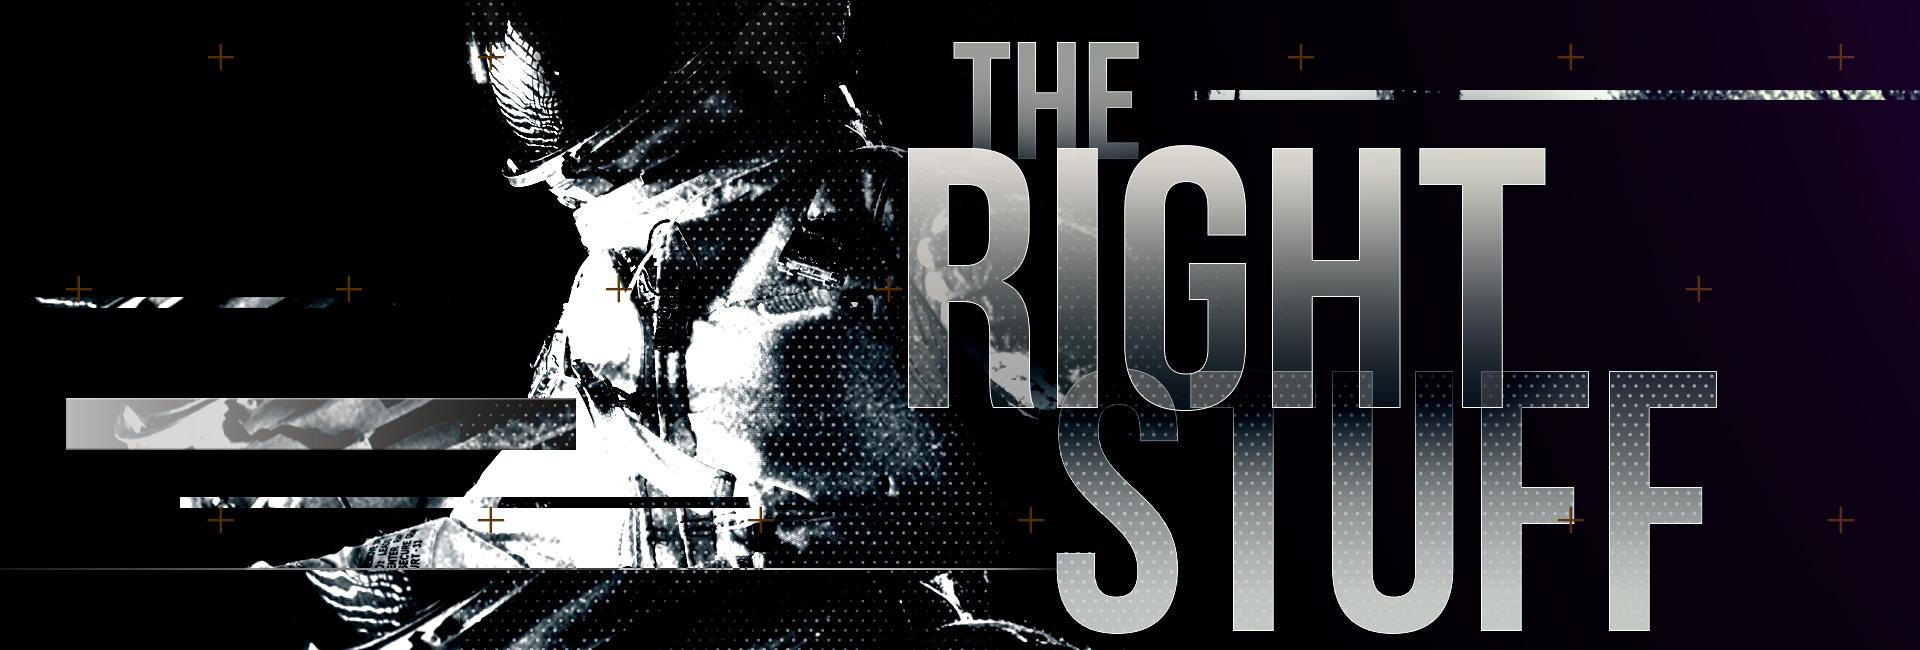 The Right Stuff Web